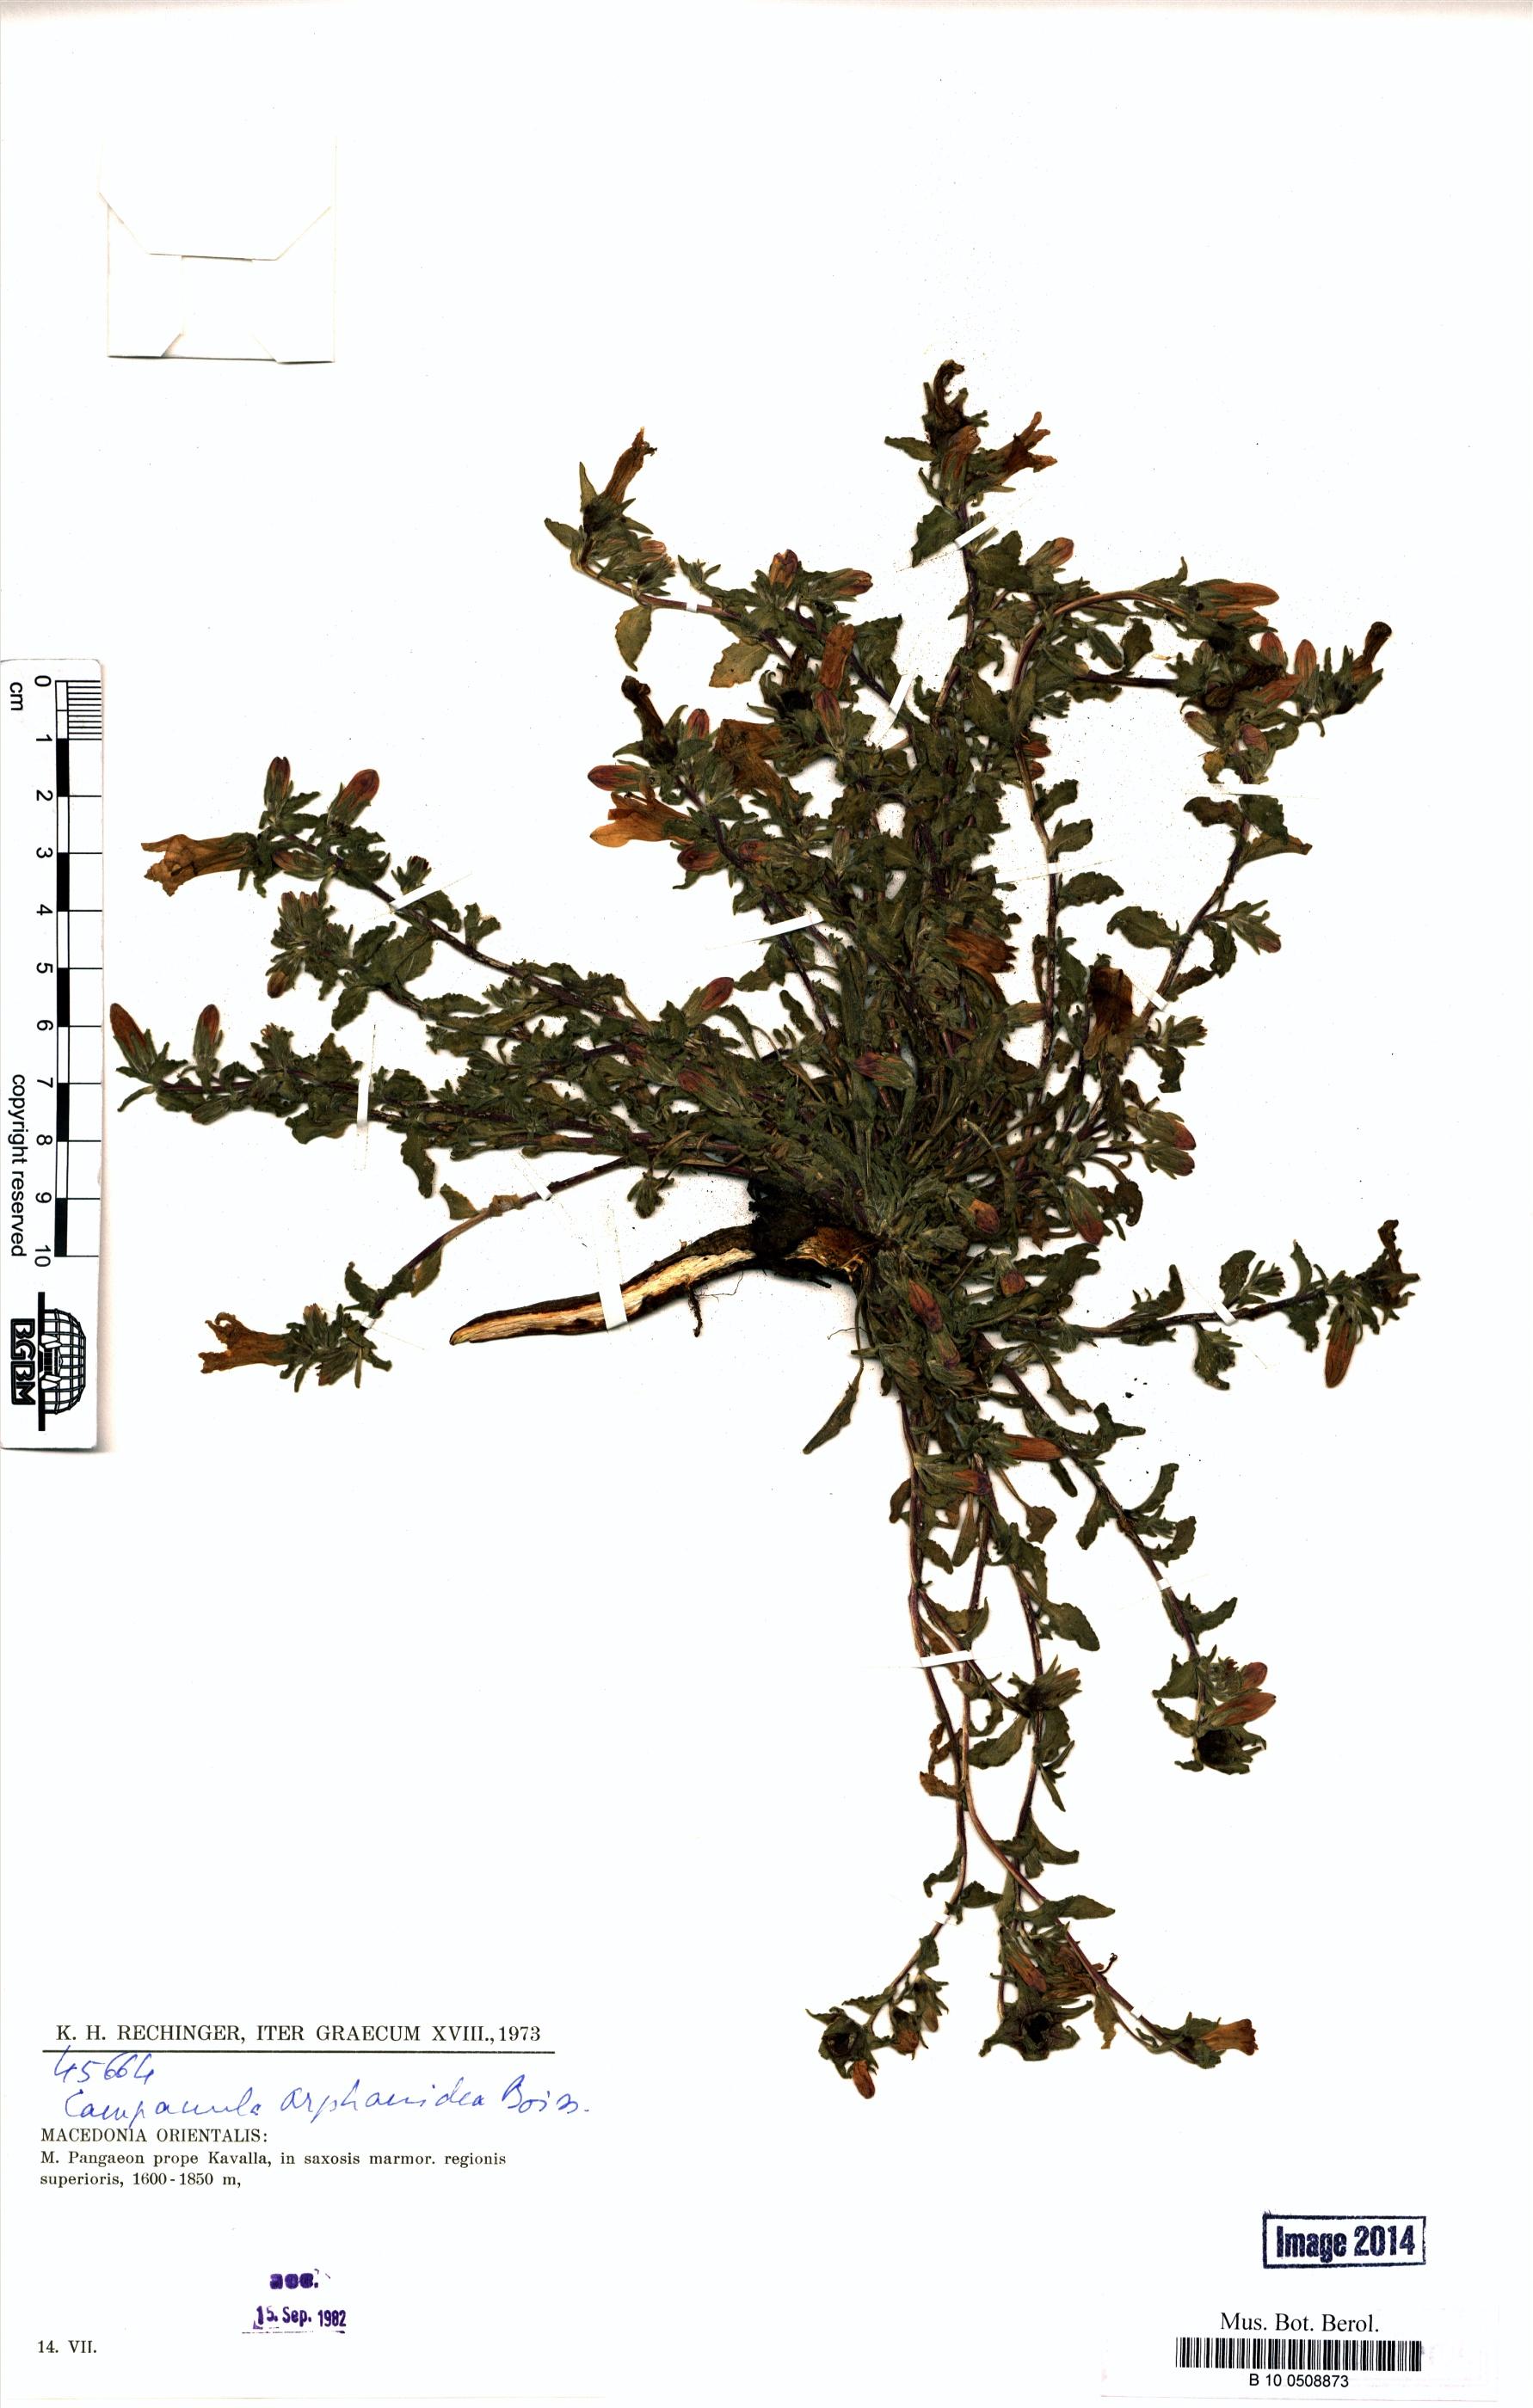 http://ww2.bgbm.org/herbarium/images/B/10/05/08/87/B_10_0508873.jpg